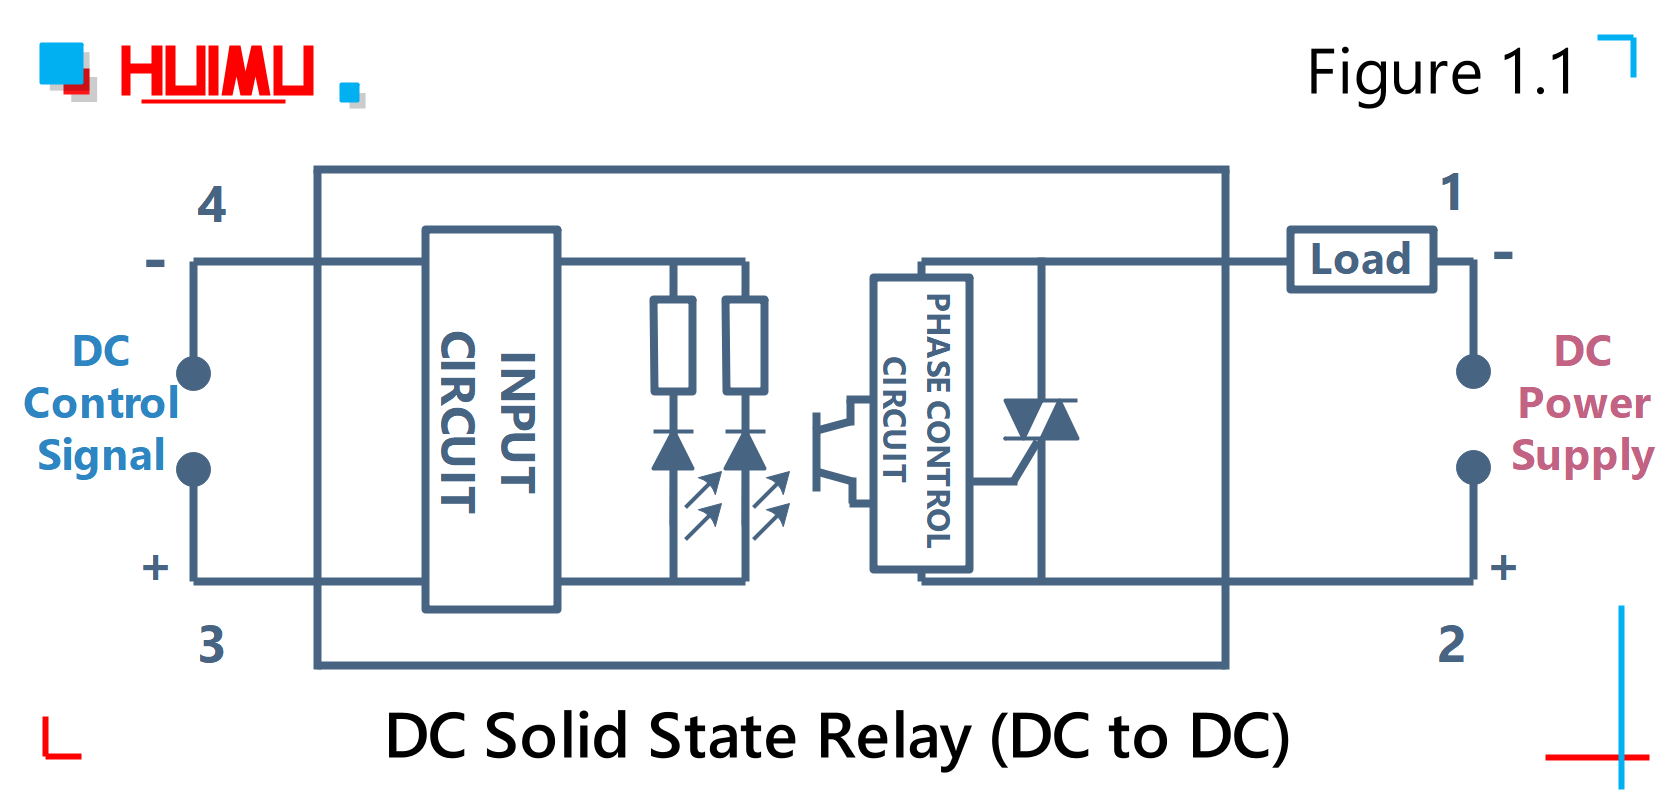 [QNCB_7524]  EK_4014] Solid State Relay Circuit Diagram On Solid State Relay Wiring  Diagram Wiring Diagram | Abb Solid State Relay Wiring Diagram |  | Para Sapebe Mohammedshrine Librar Wiring 101